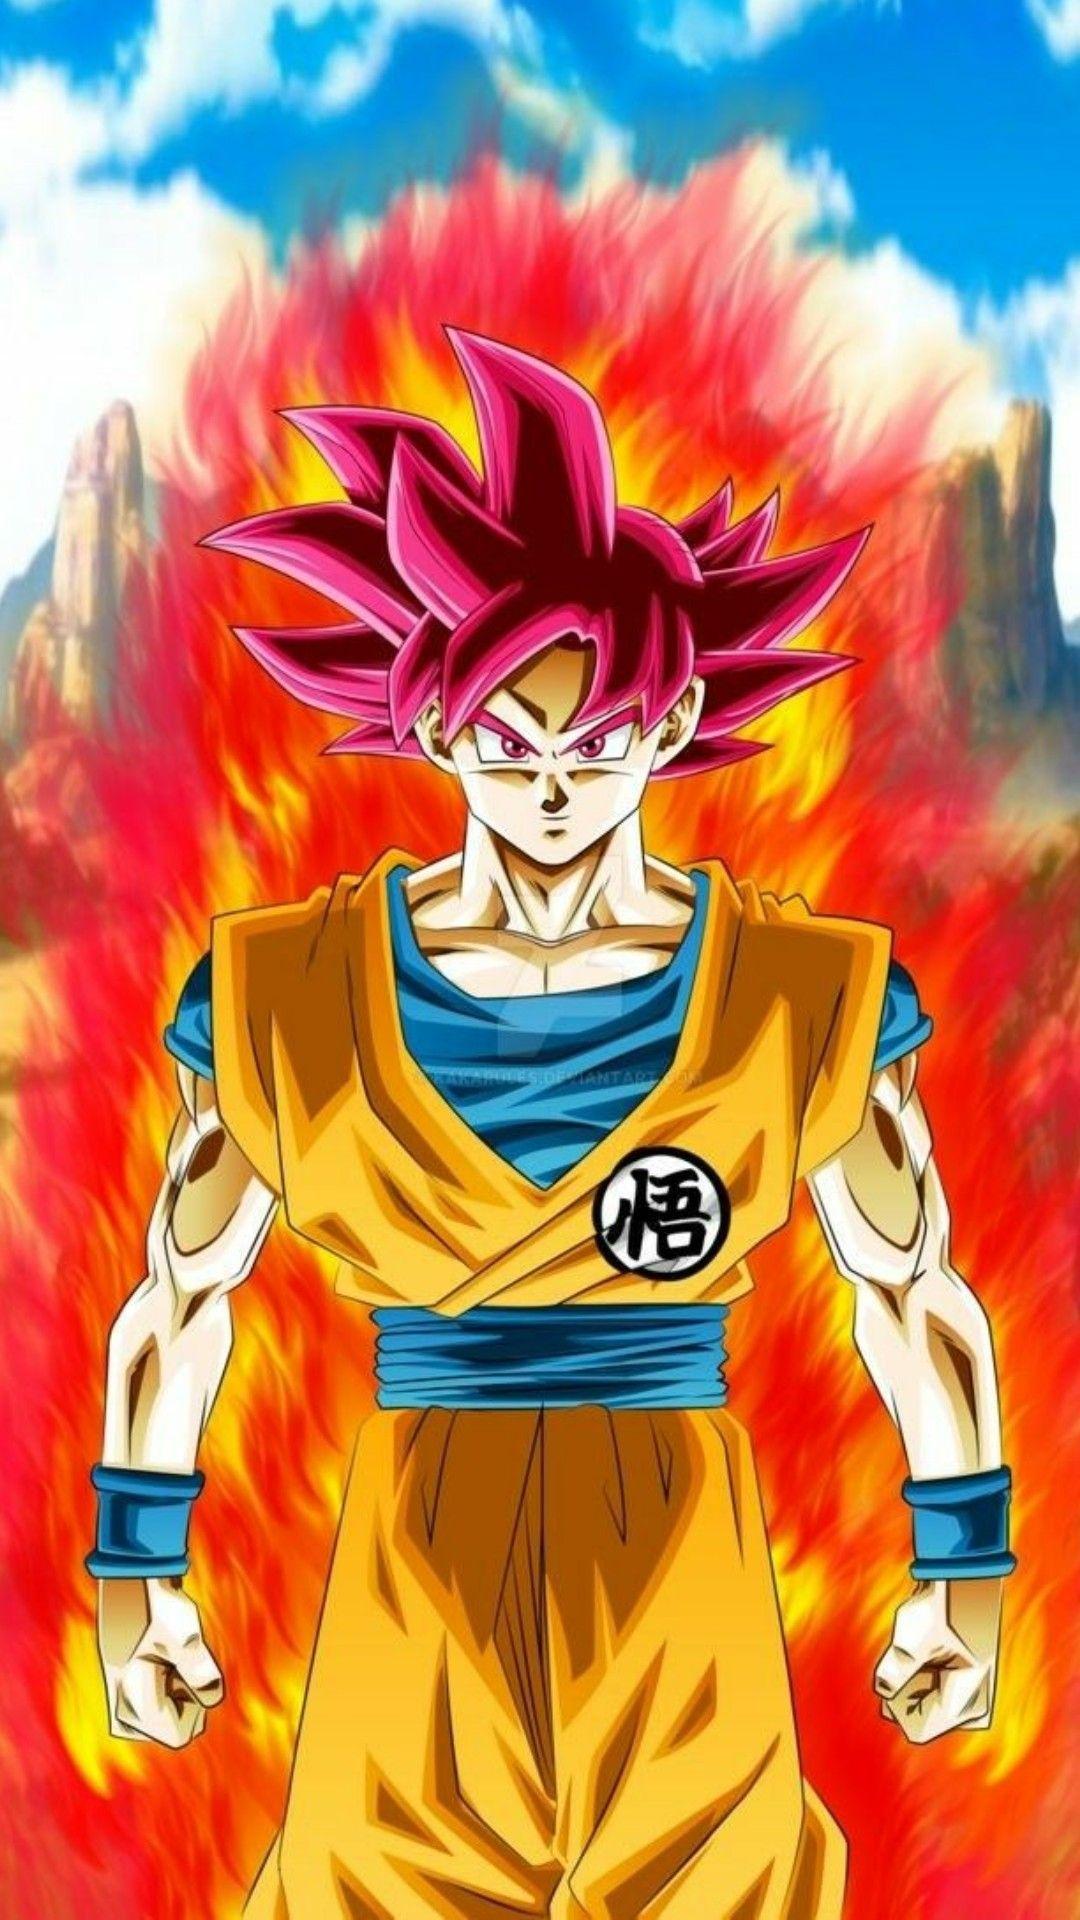 Dragon Ball Z Wallpapers Goku Super Saiyan 12 76 images in 1080x1920